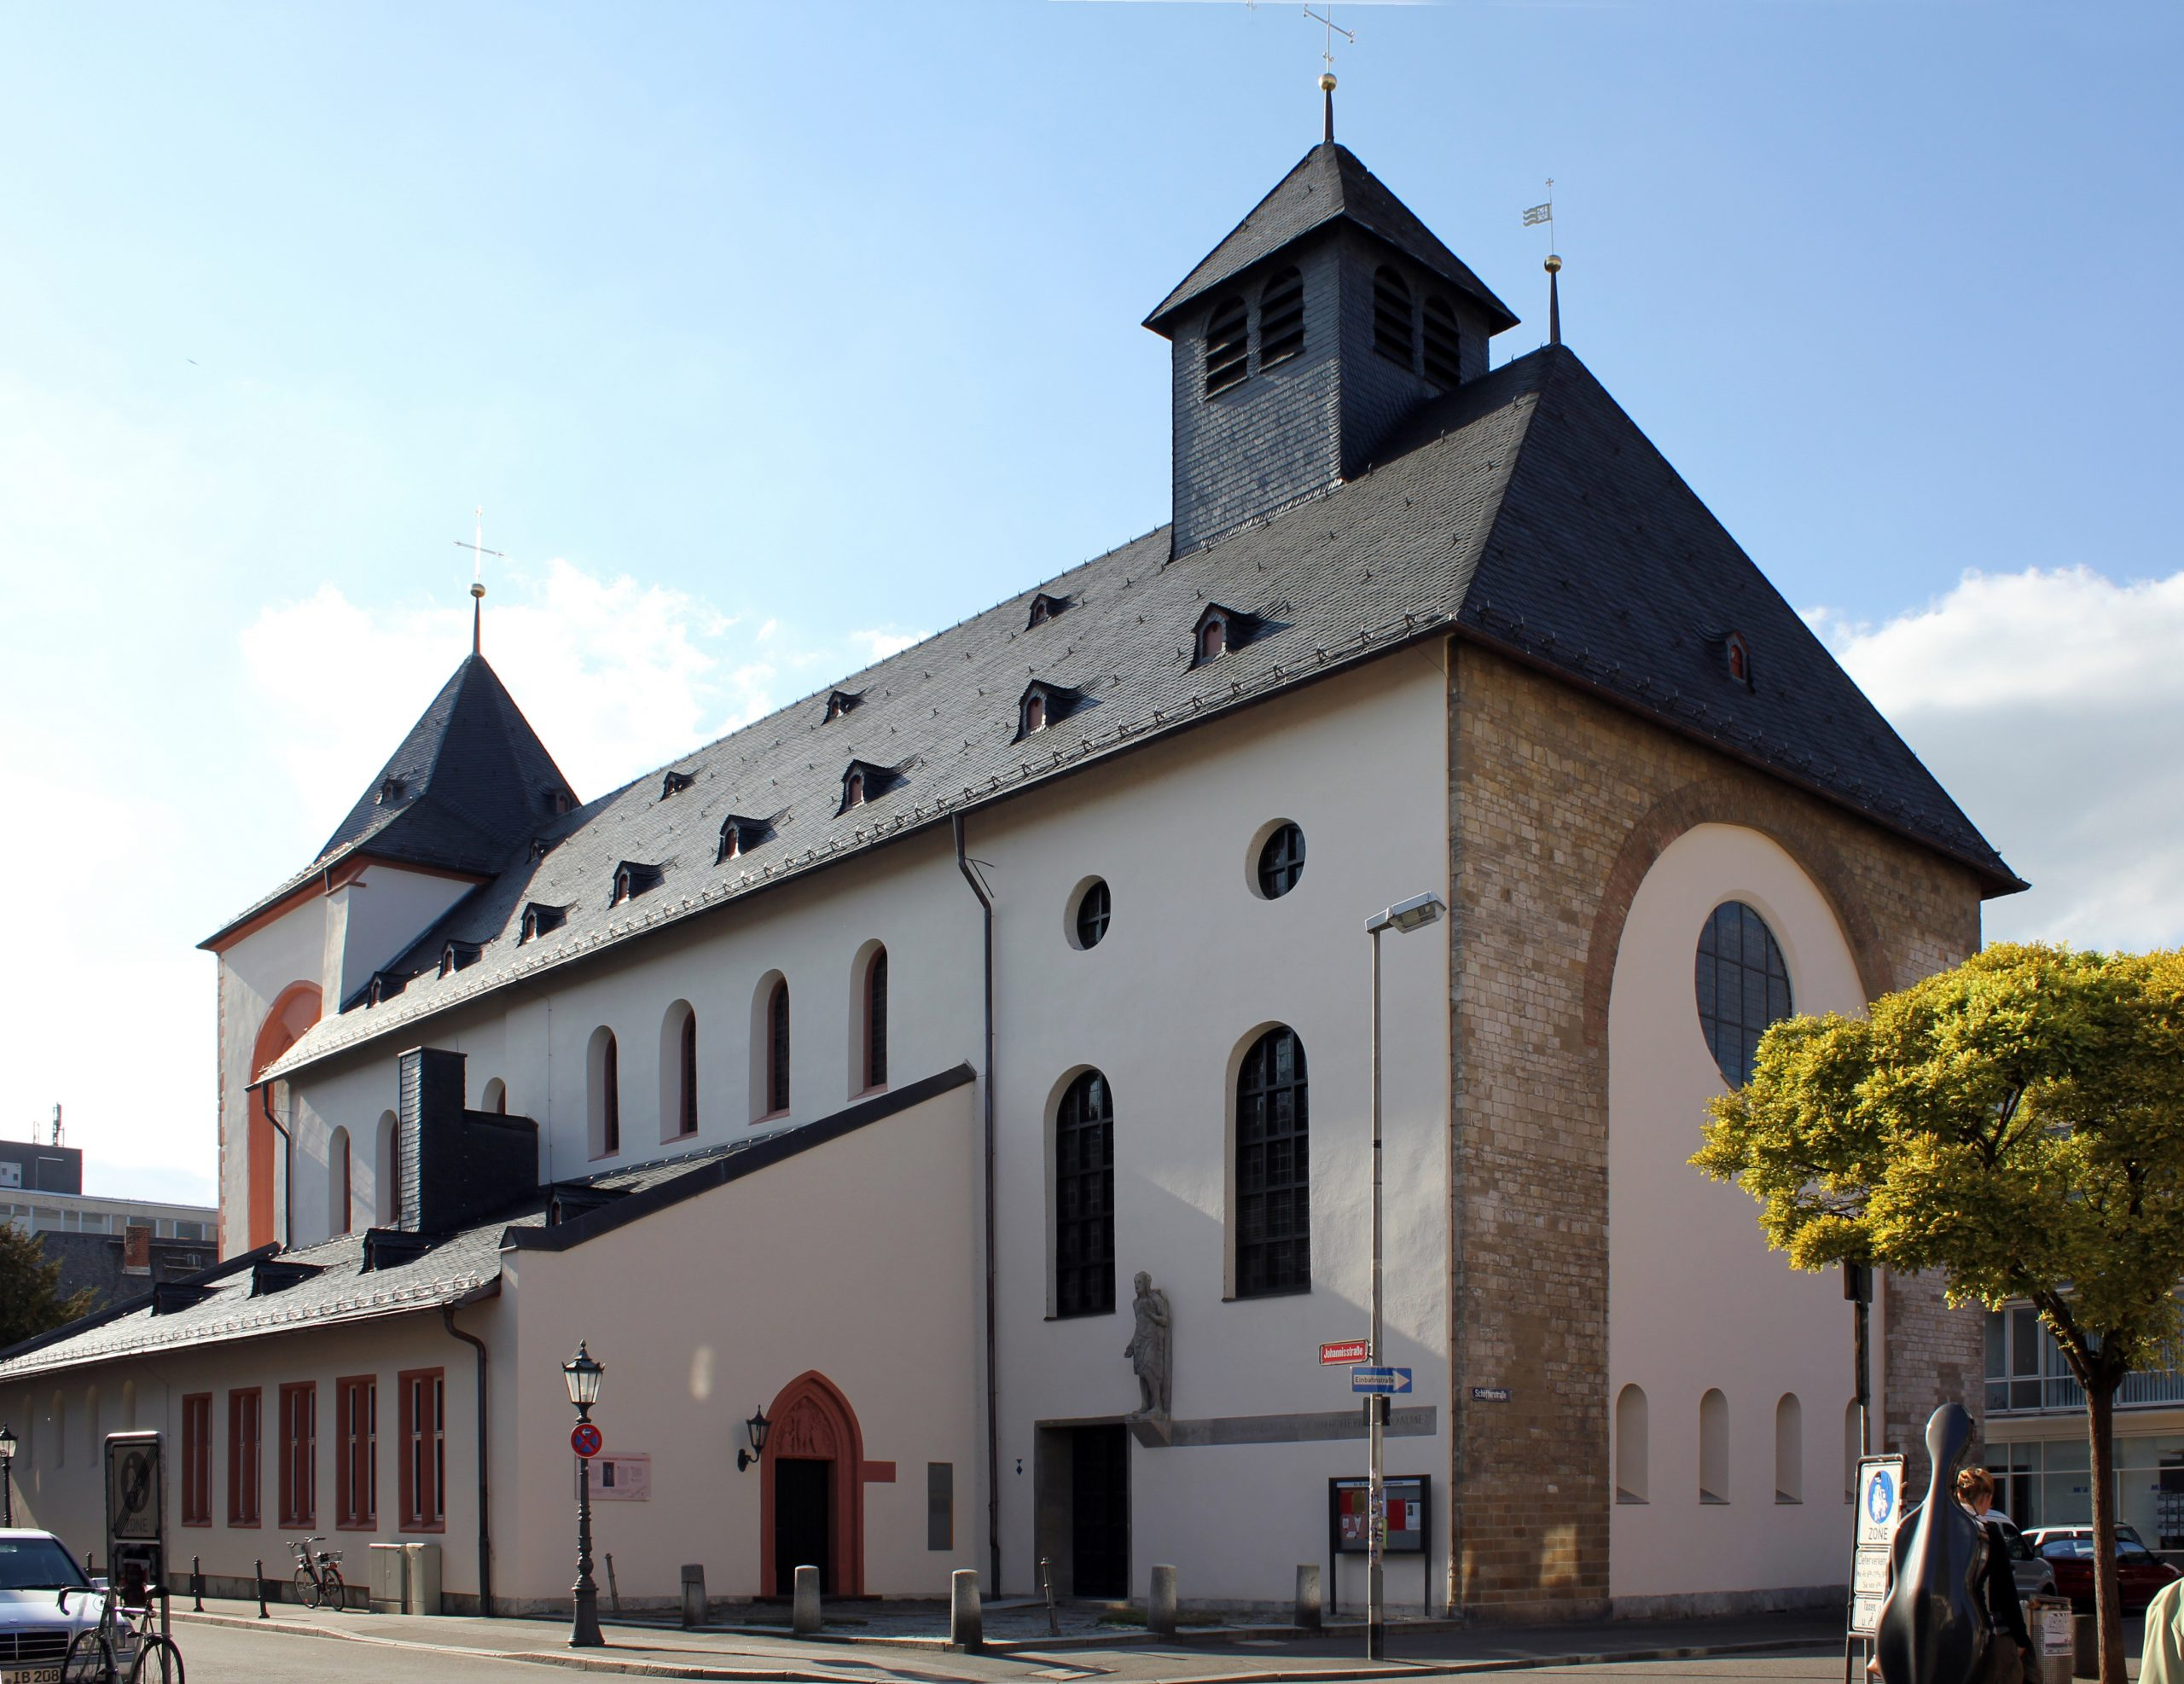 FOTO/Johanniskirche, Mainz, Wikimedia Commons